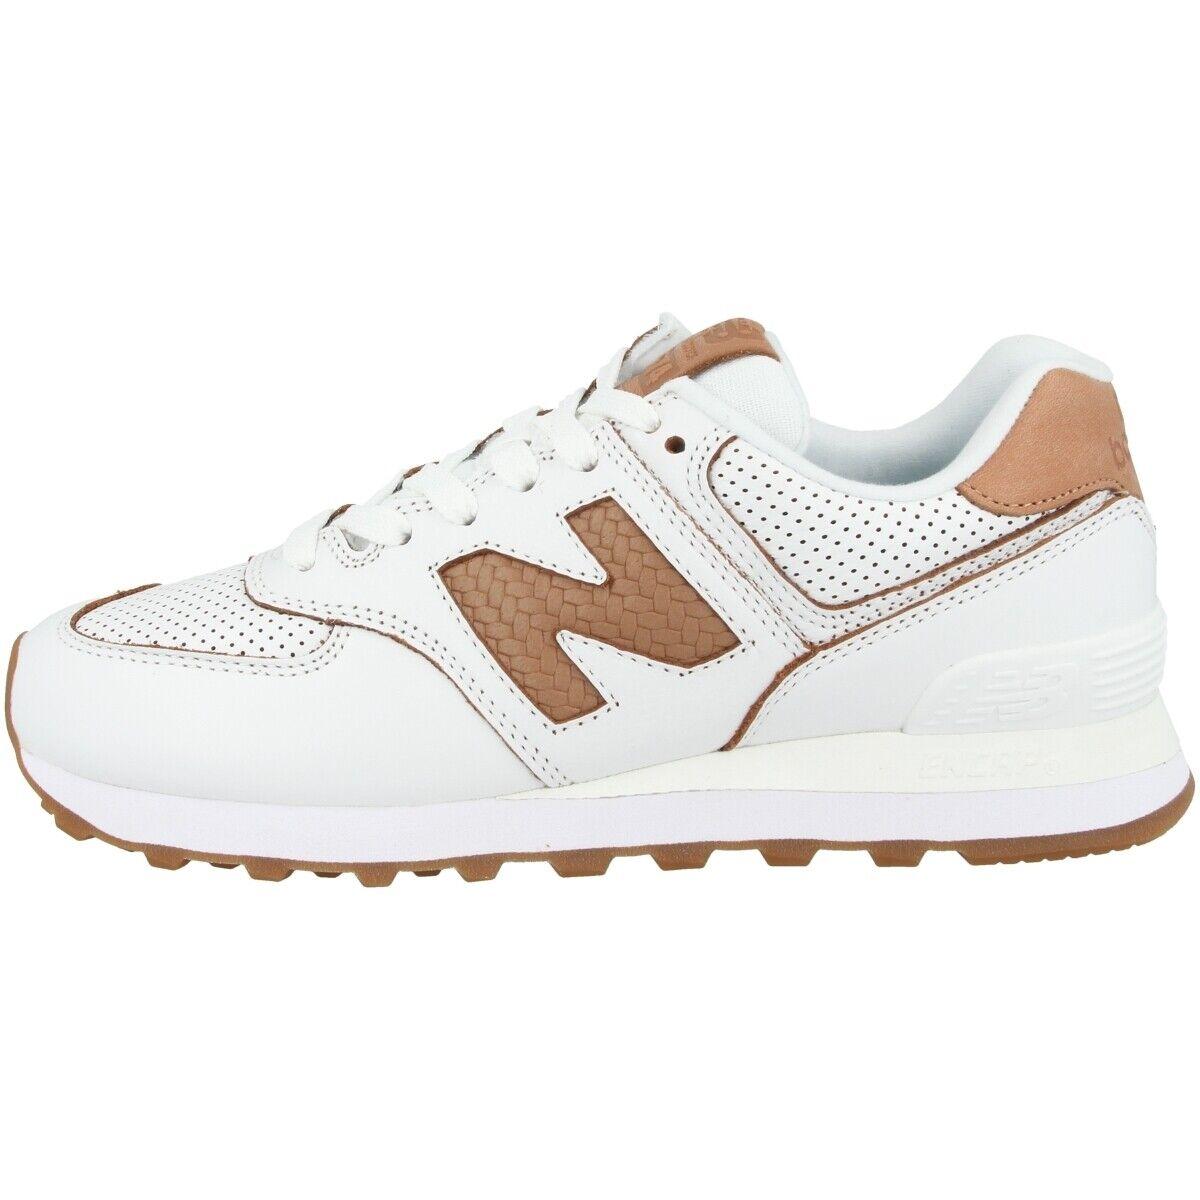 New Balance WL 574 WNG Schuhe Damen Turnschuhe Turnschuhe Weiß veg tan WL574WNG